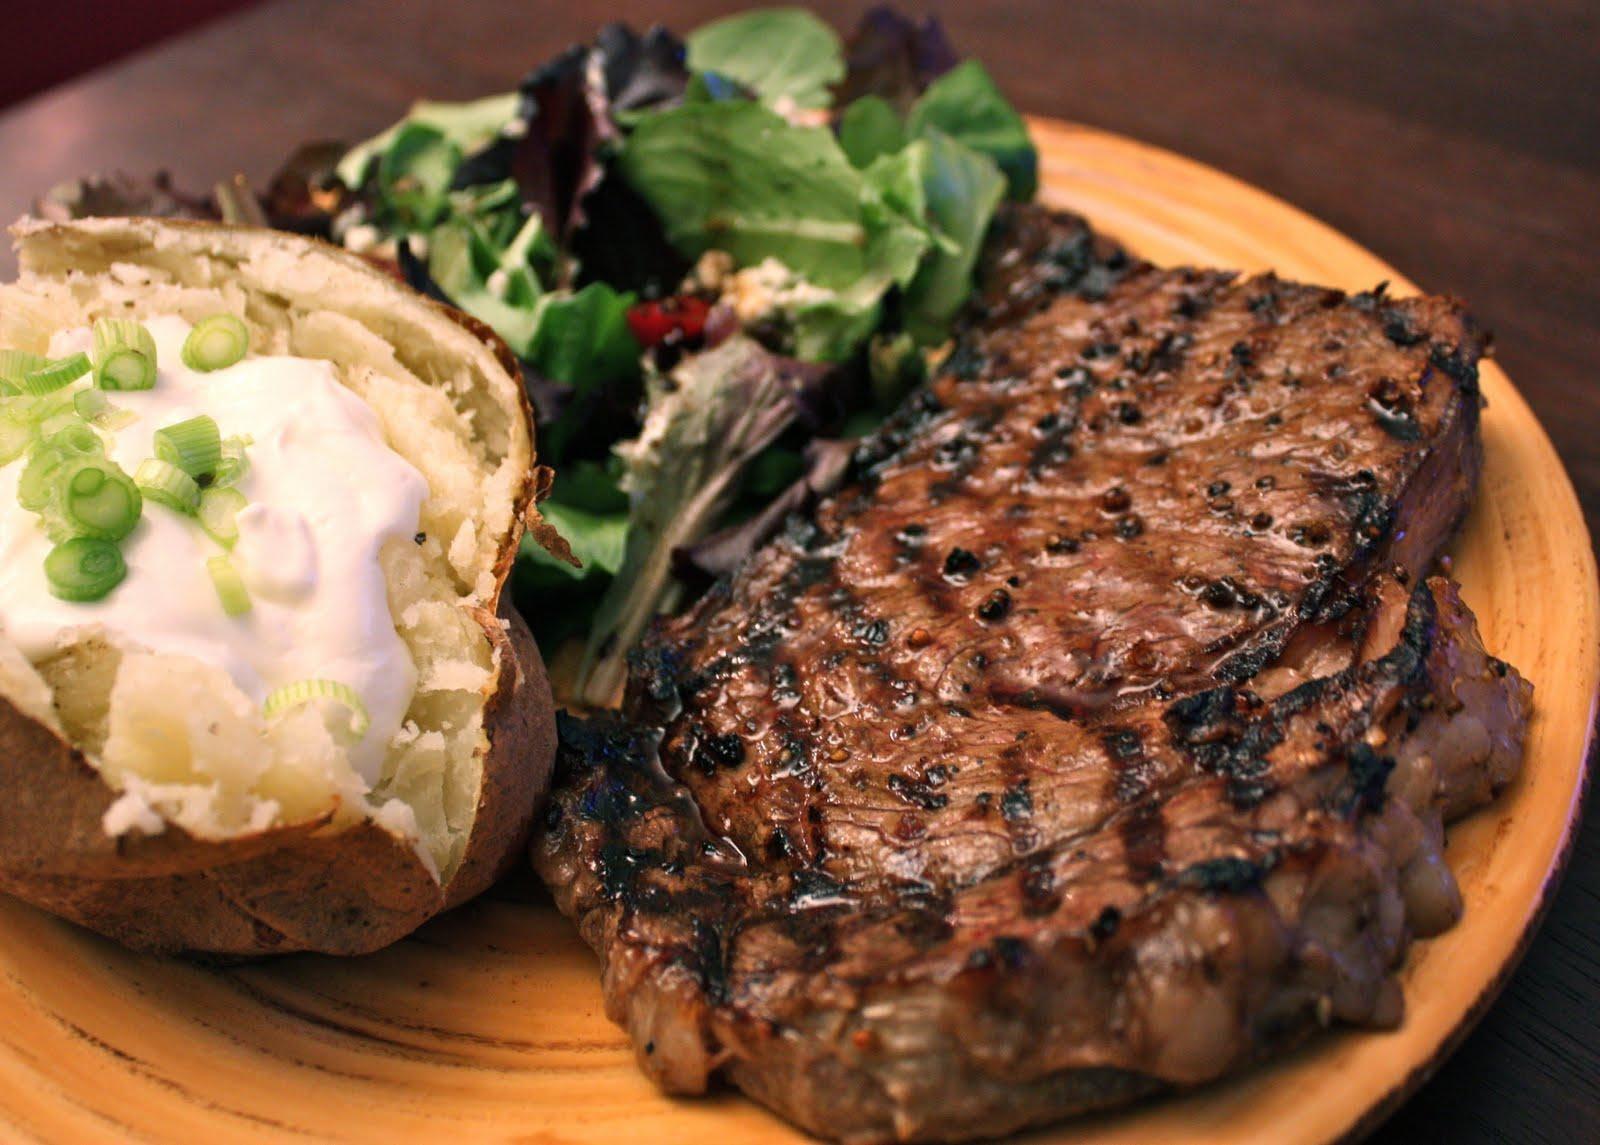 Steak Dinner & Auction at 6156 Studley Rd, Mechanicsville